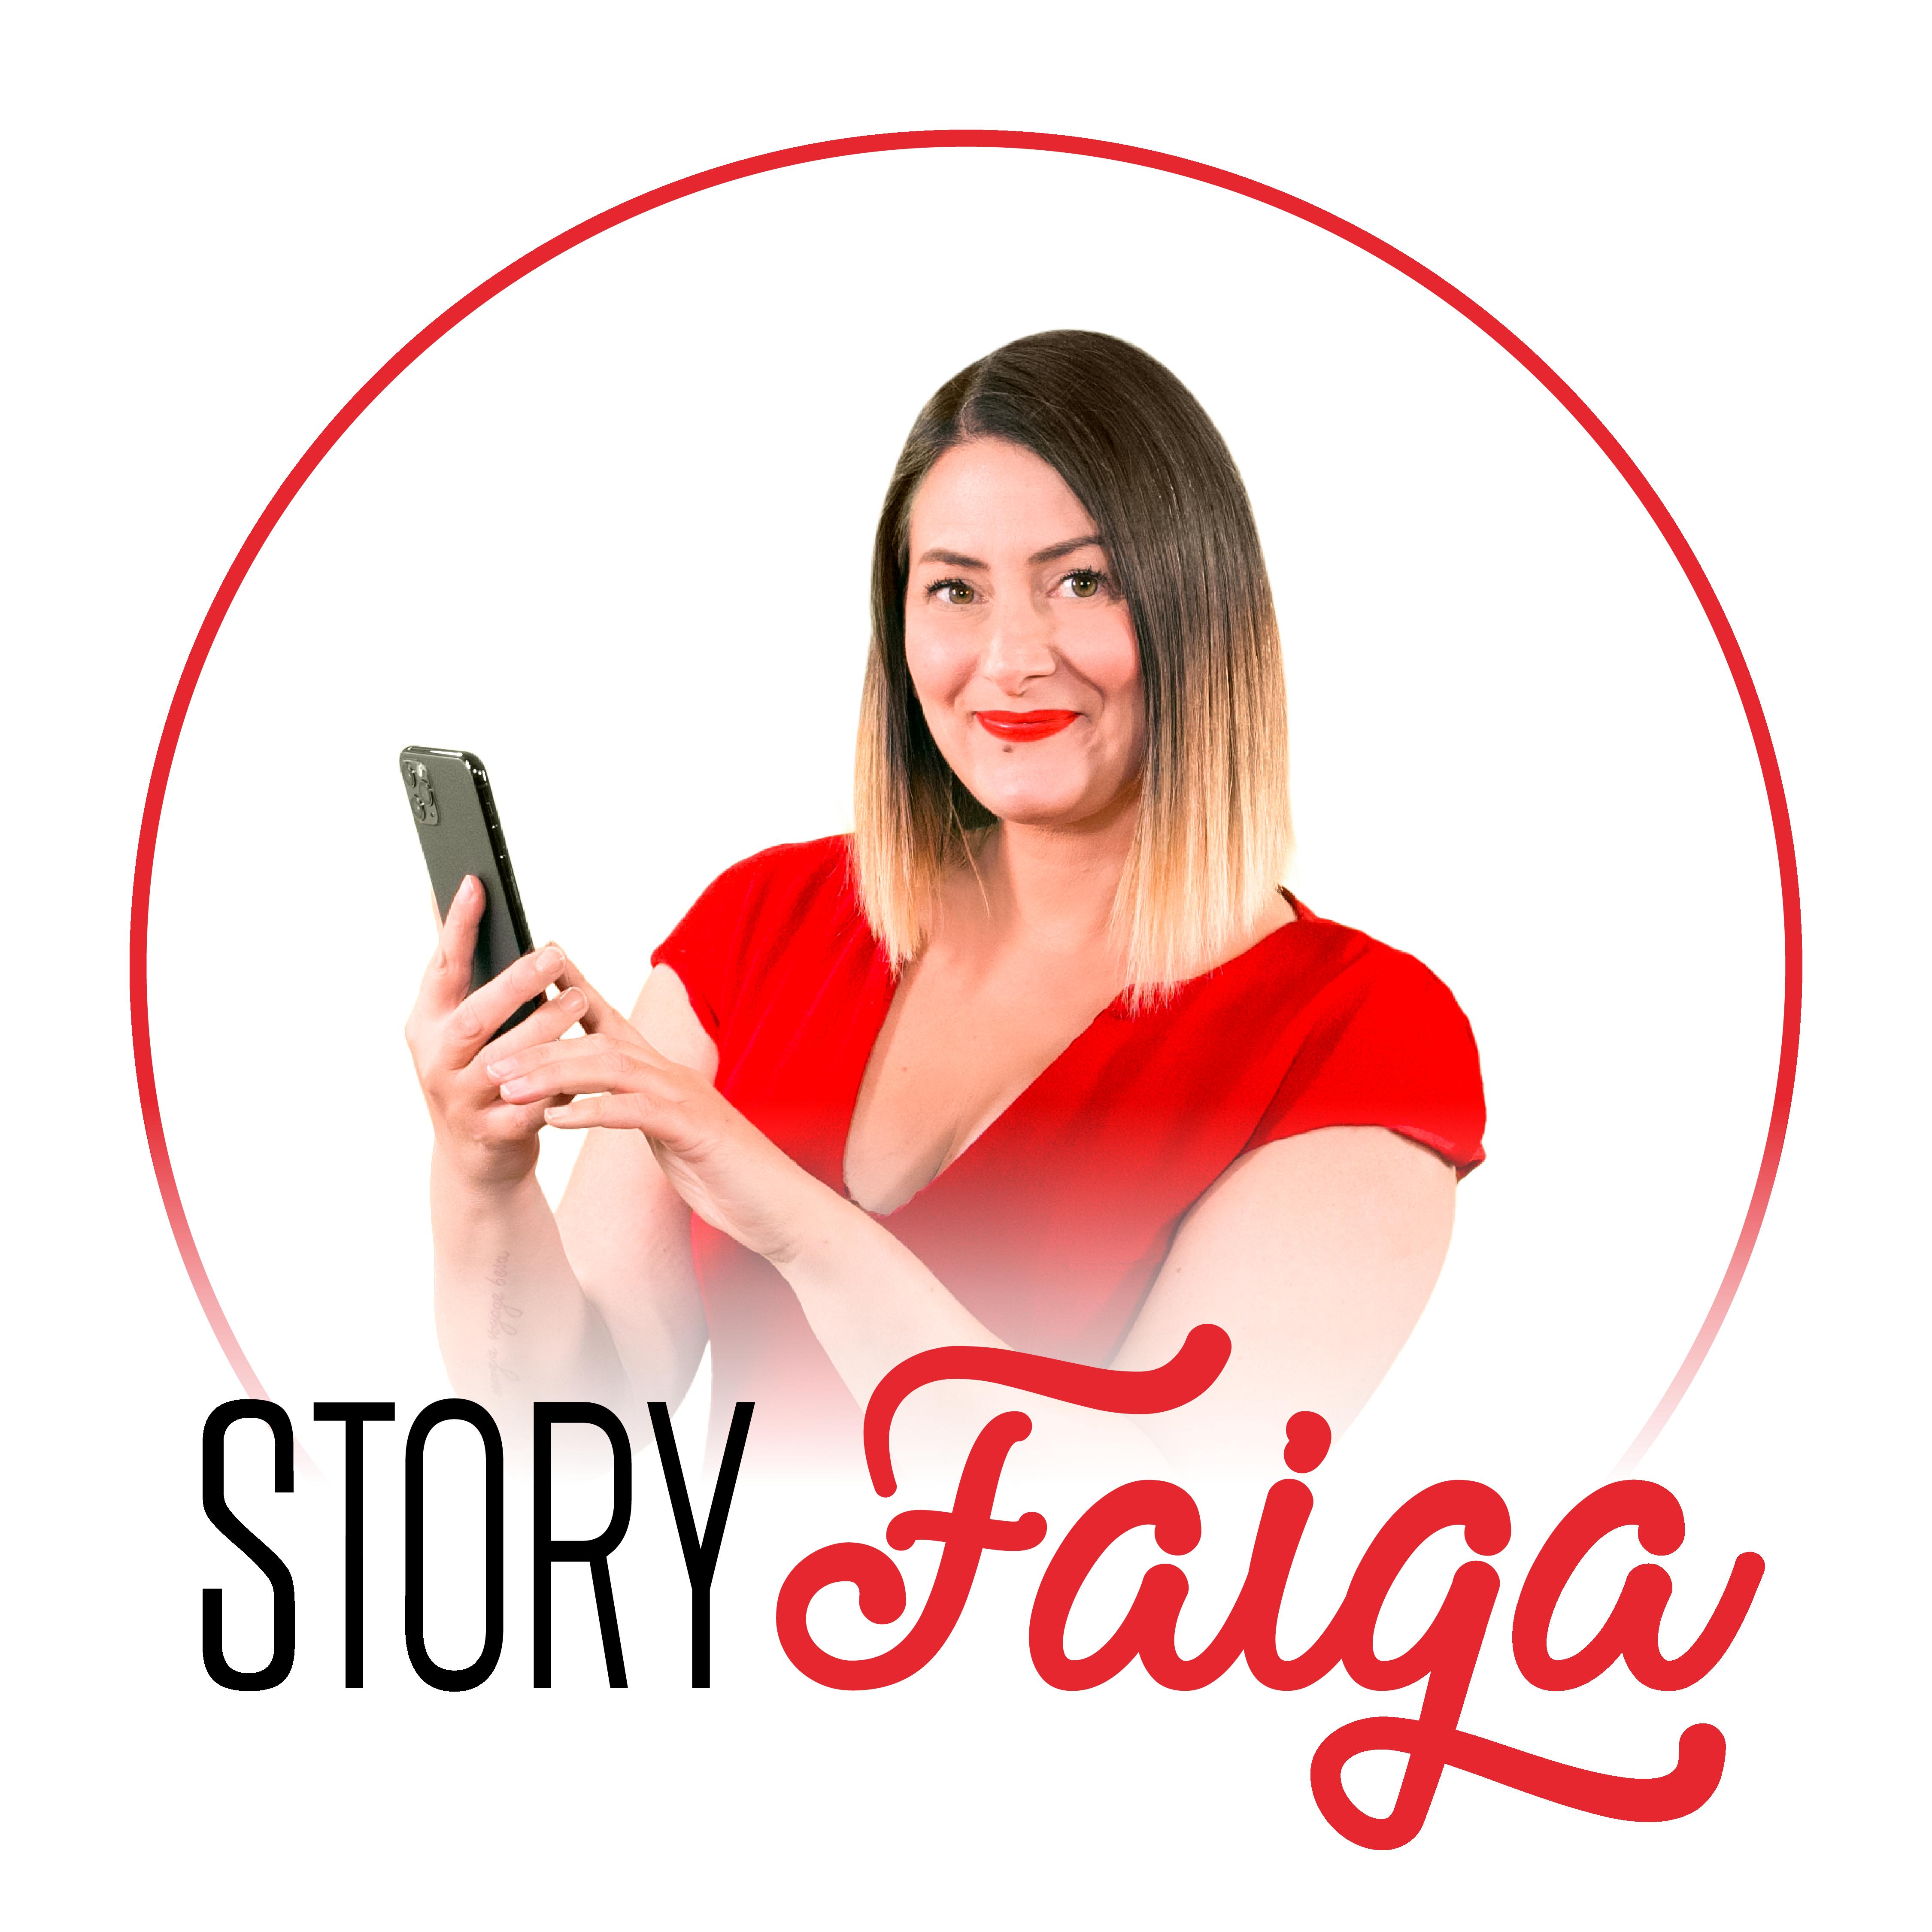 StoryFaiga